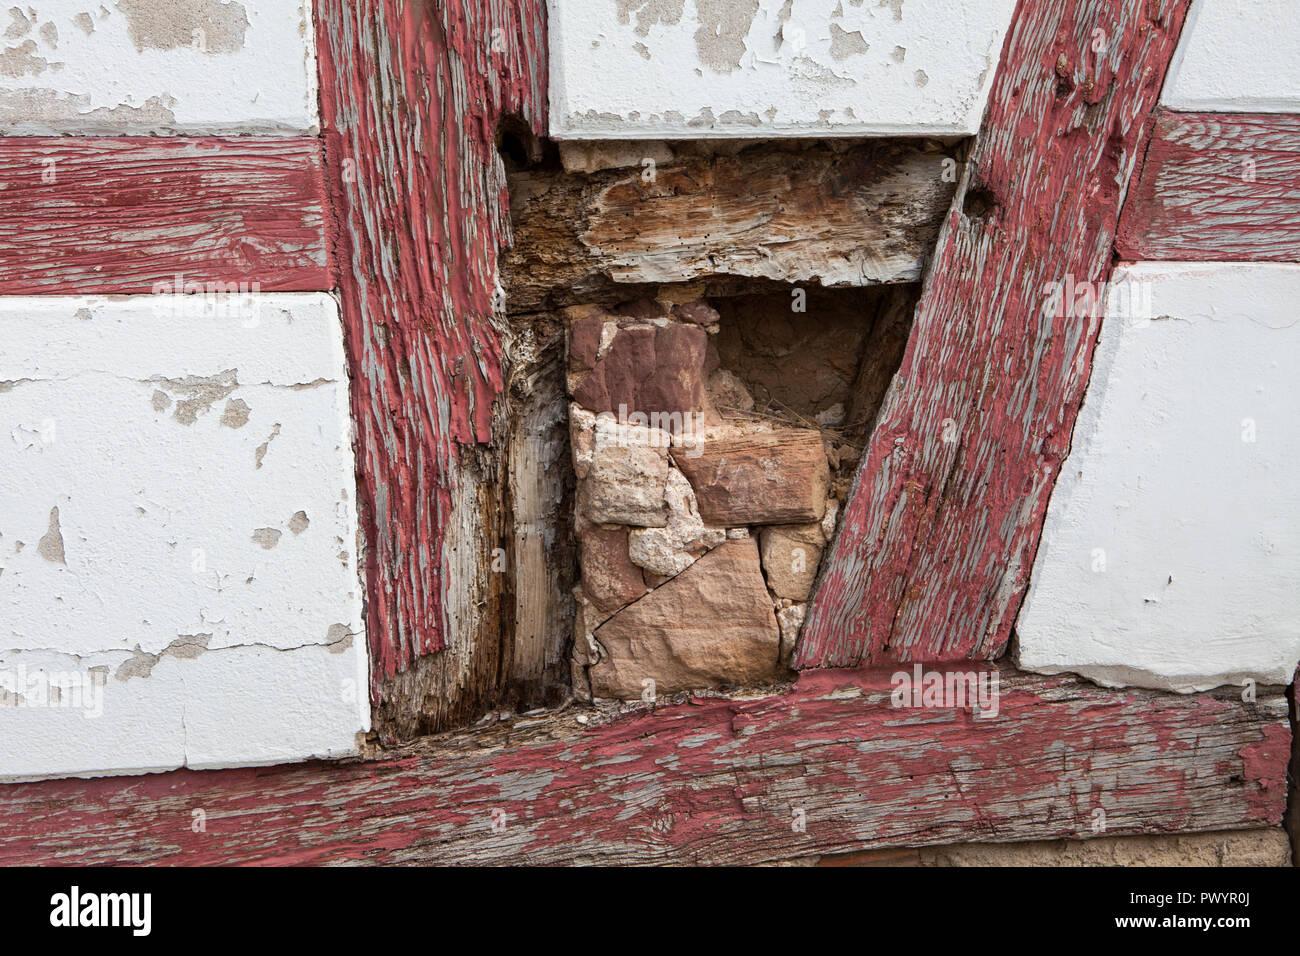 Damaged half-timbered house, Duderstadt, Lower Saxony, Germany, Europe Stock Photo